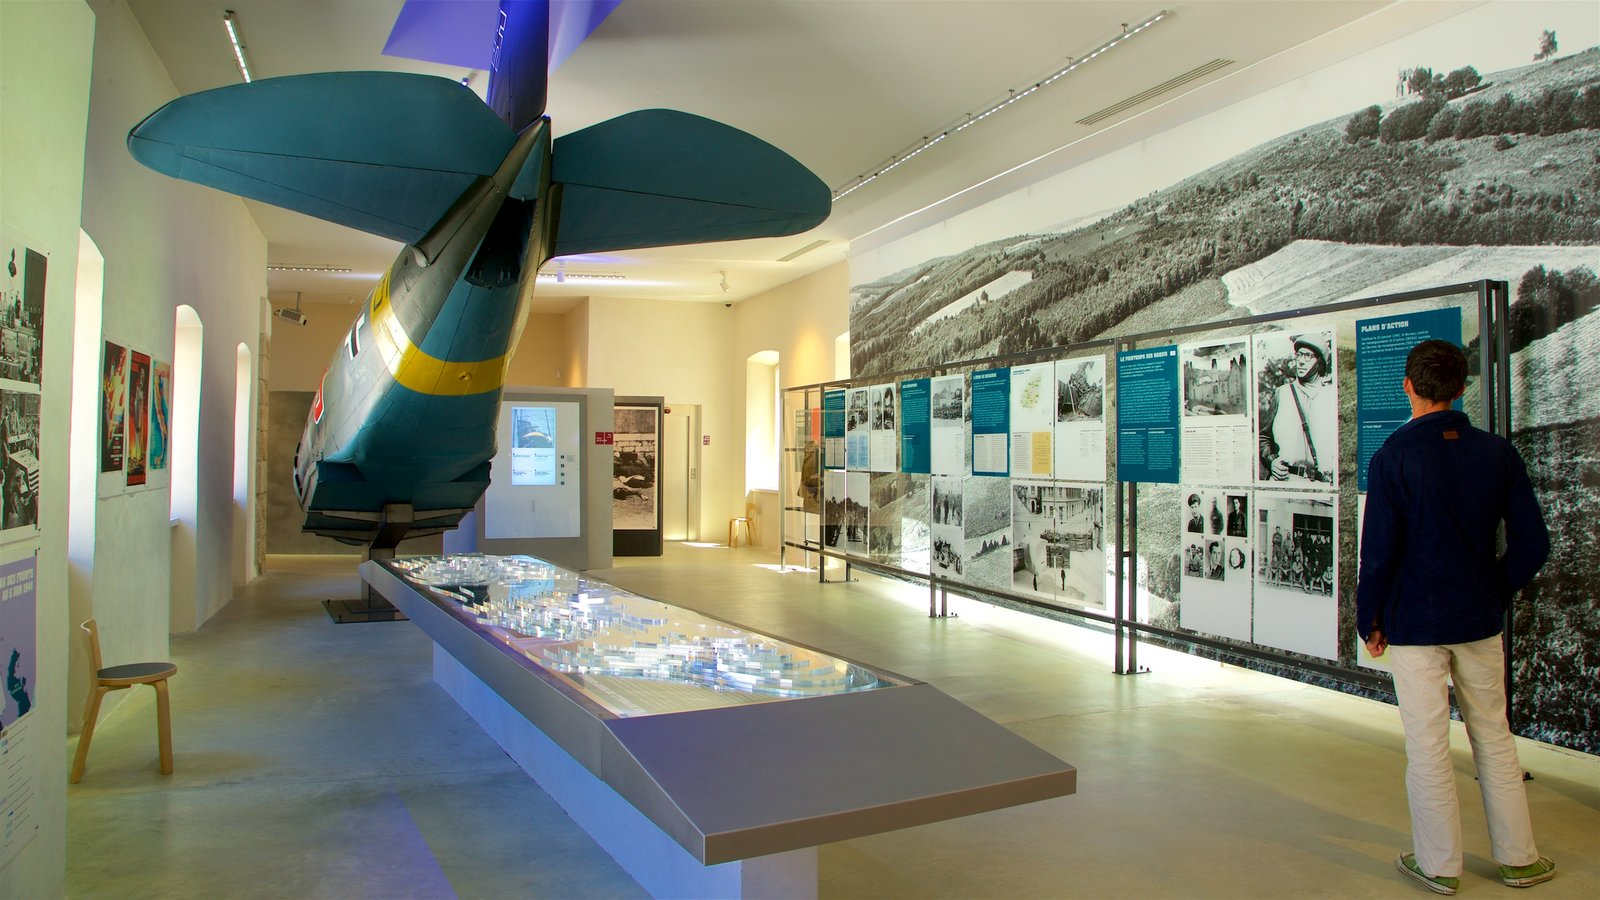 Musée de la Résistance featuring interior views as well as an individual male